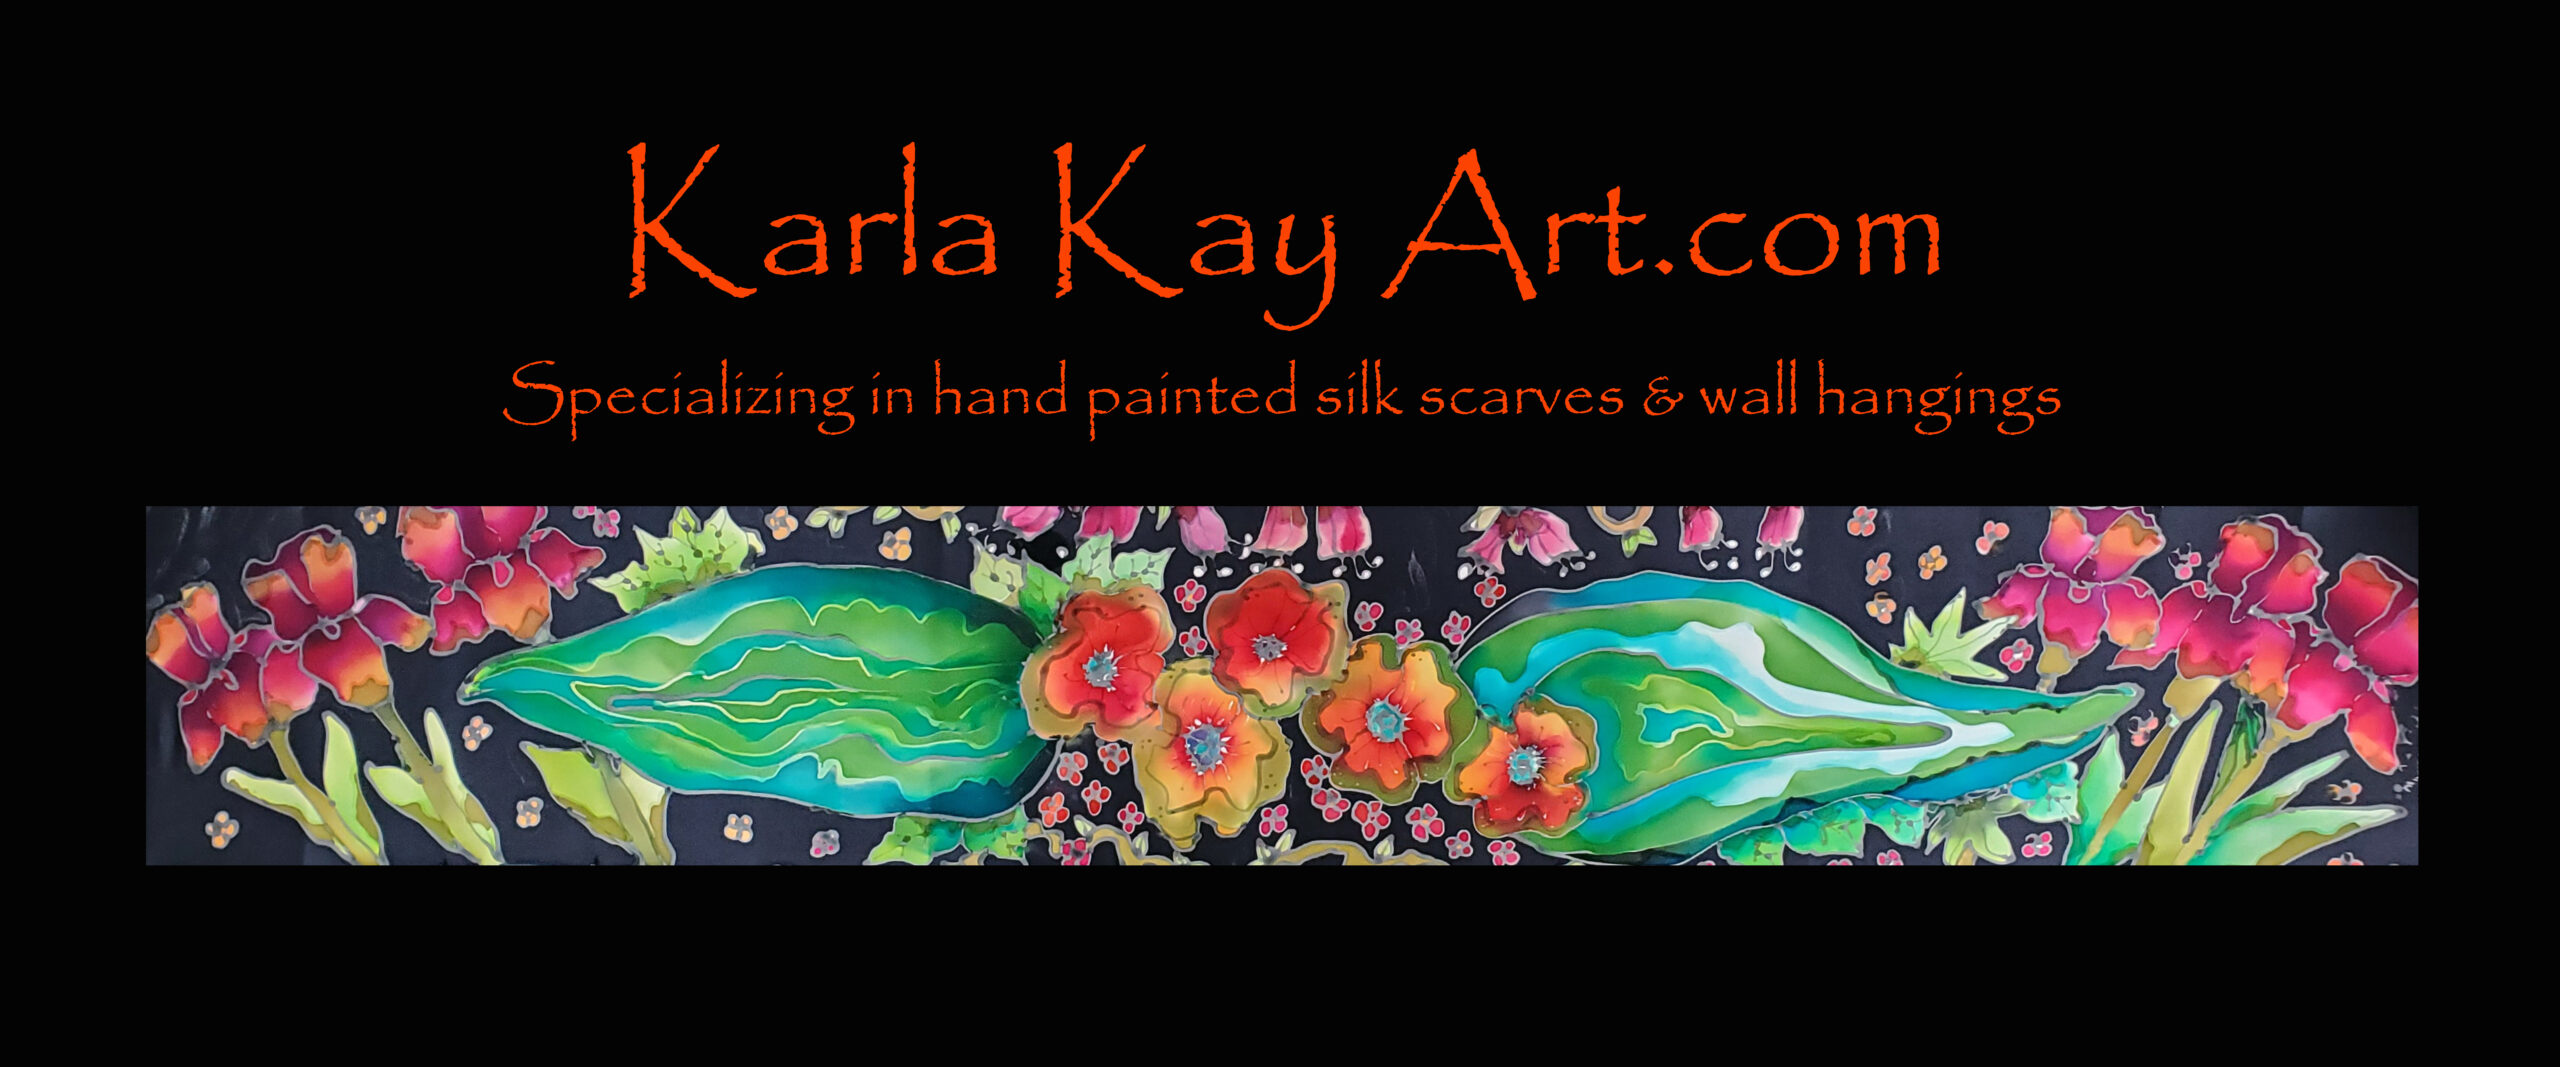 Karla Kay Art